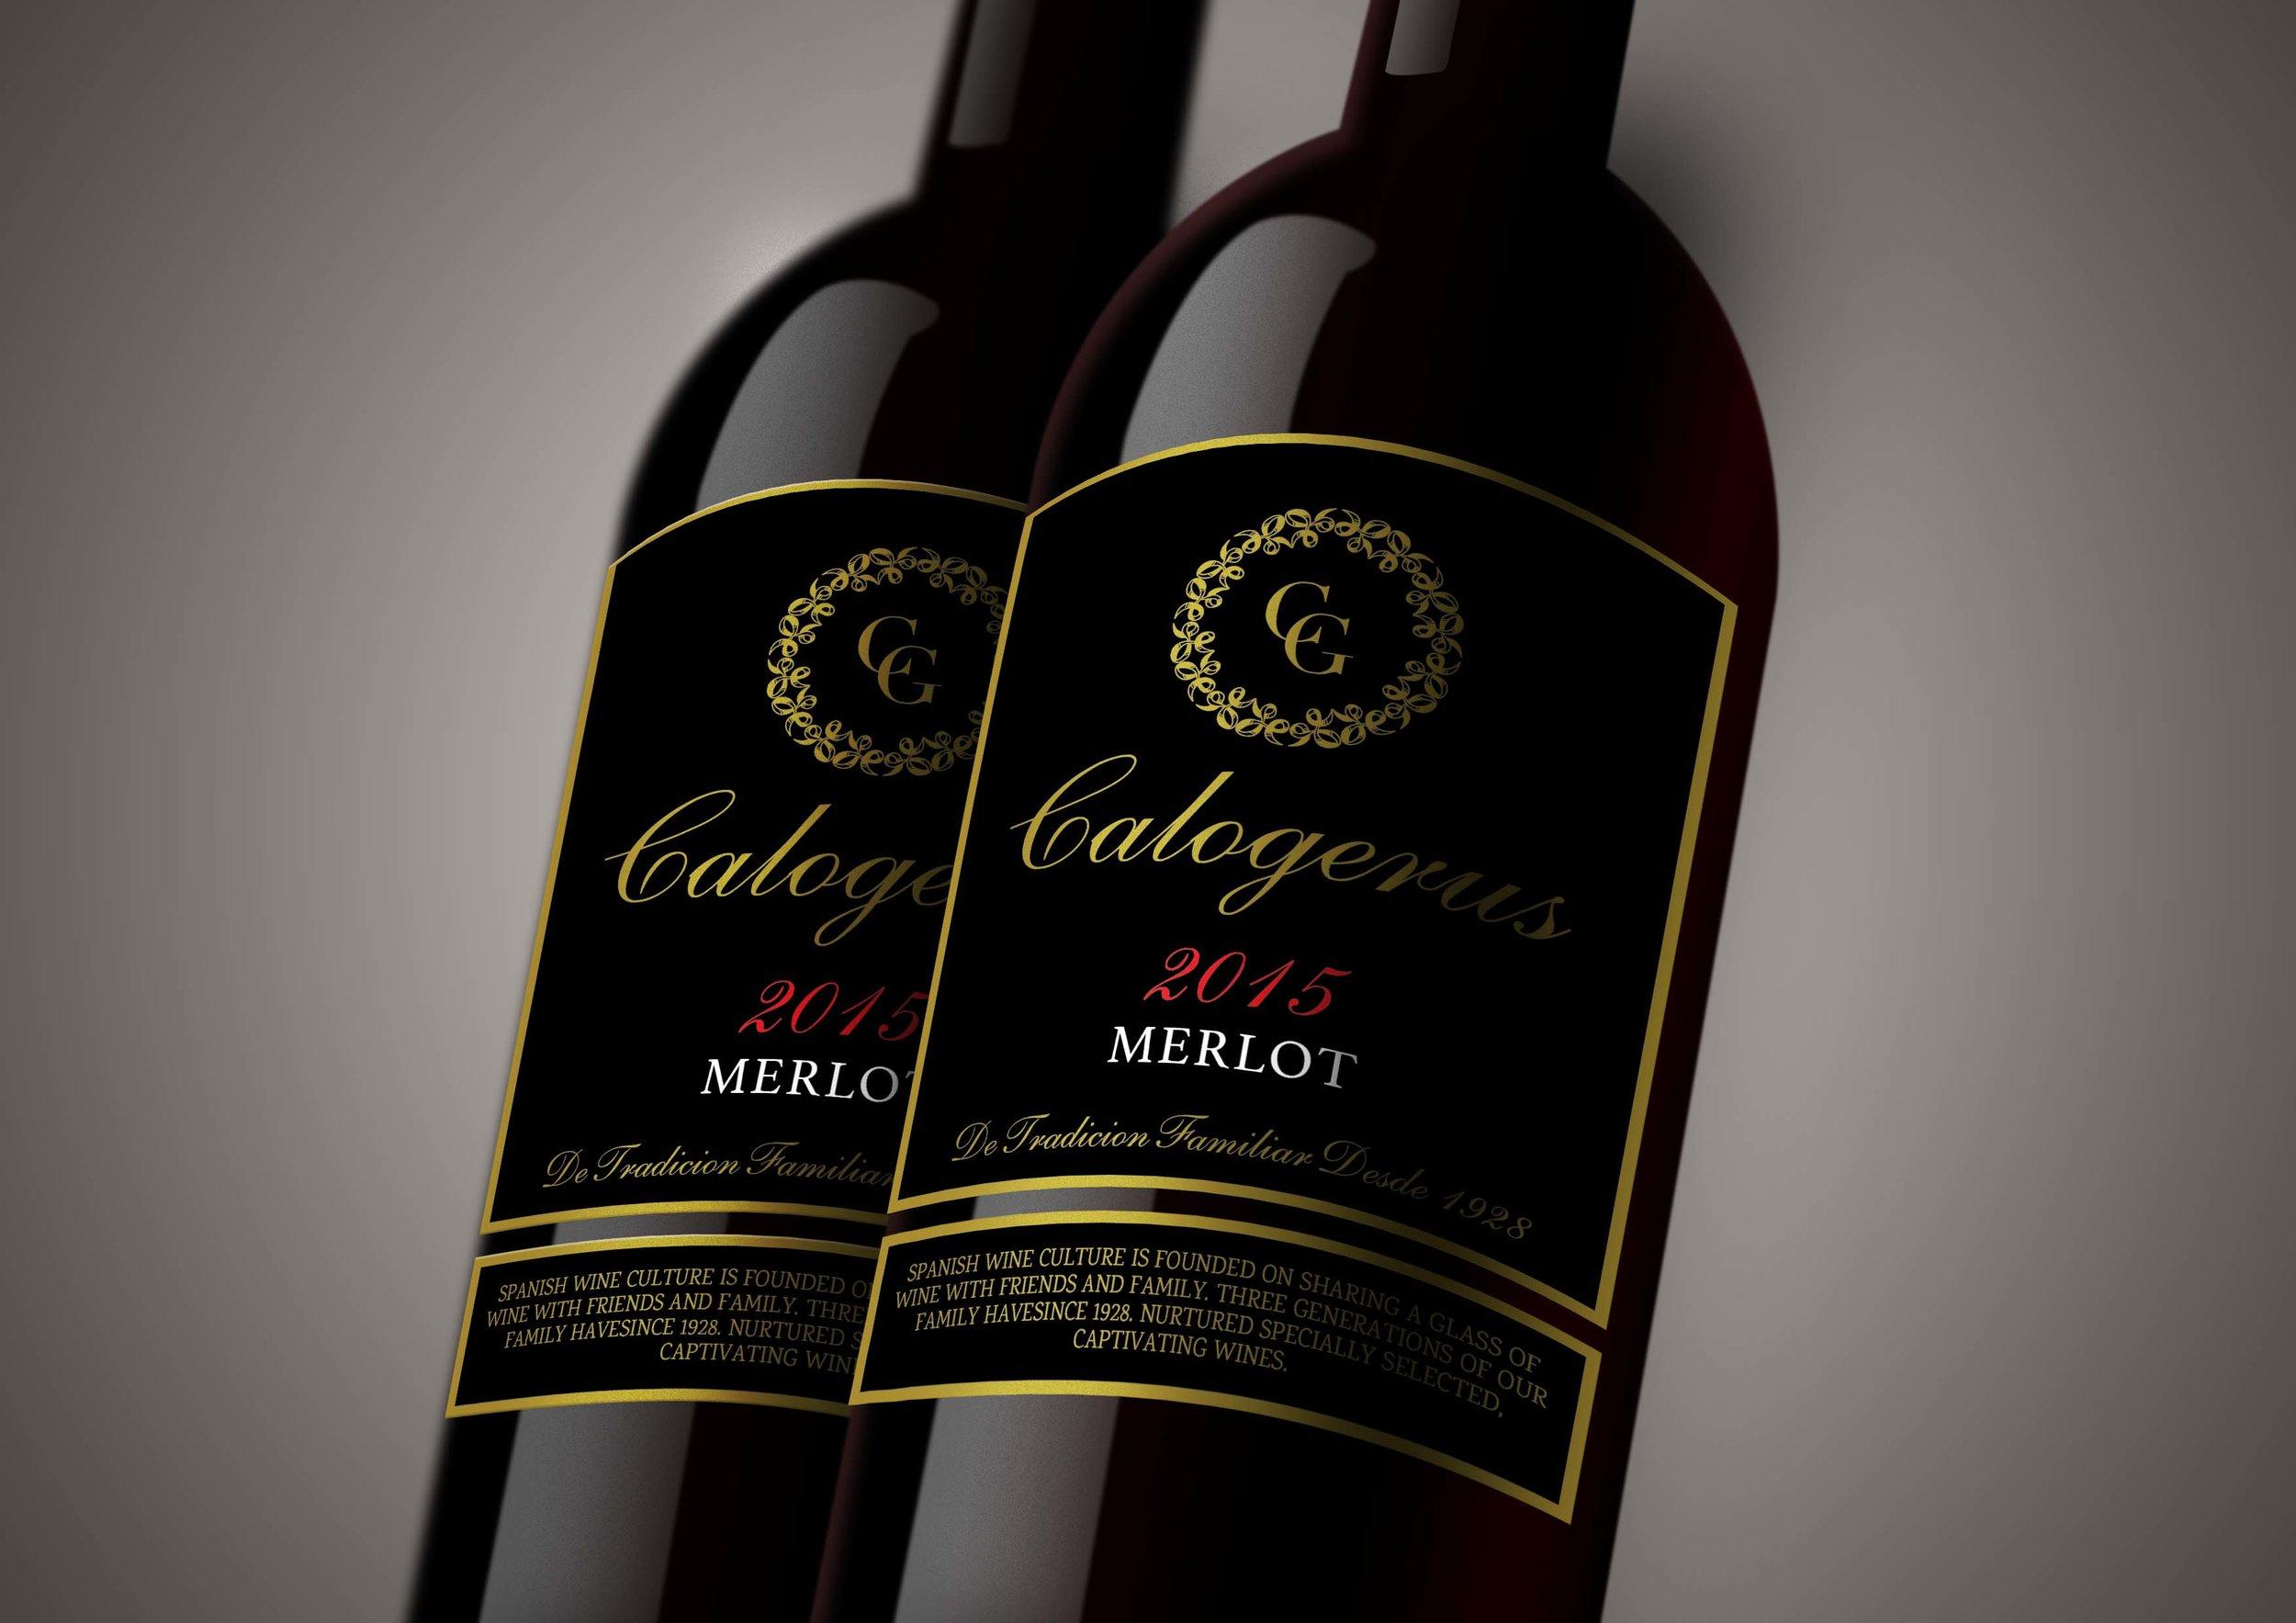 2 Bottle Mock Up Calogerus.jpg